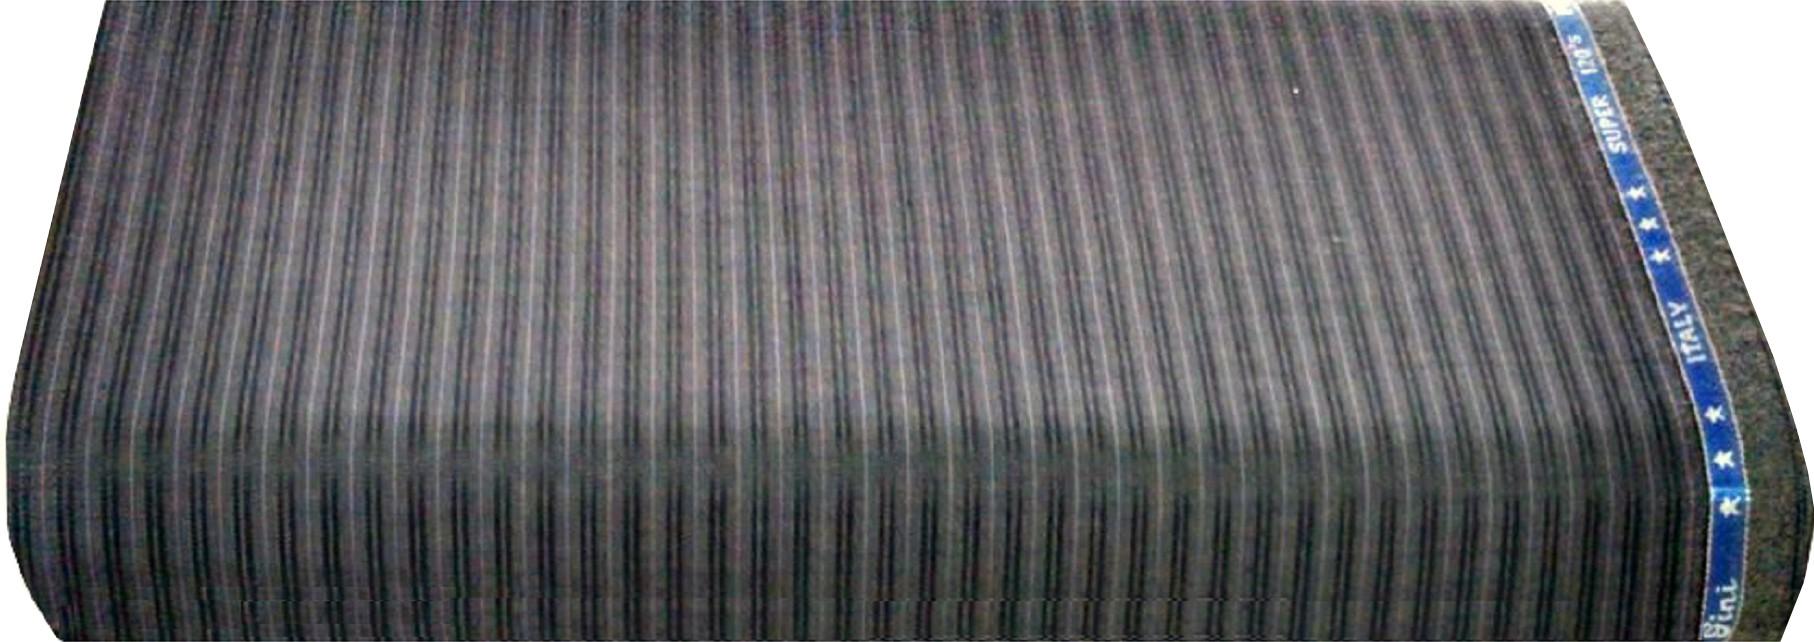 Ivo Gini Wool Striped Salwar Suit Dupatta Material(Un-stitched)